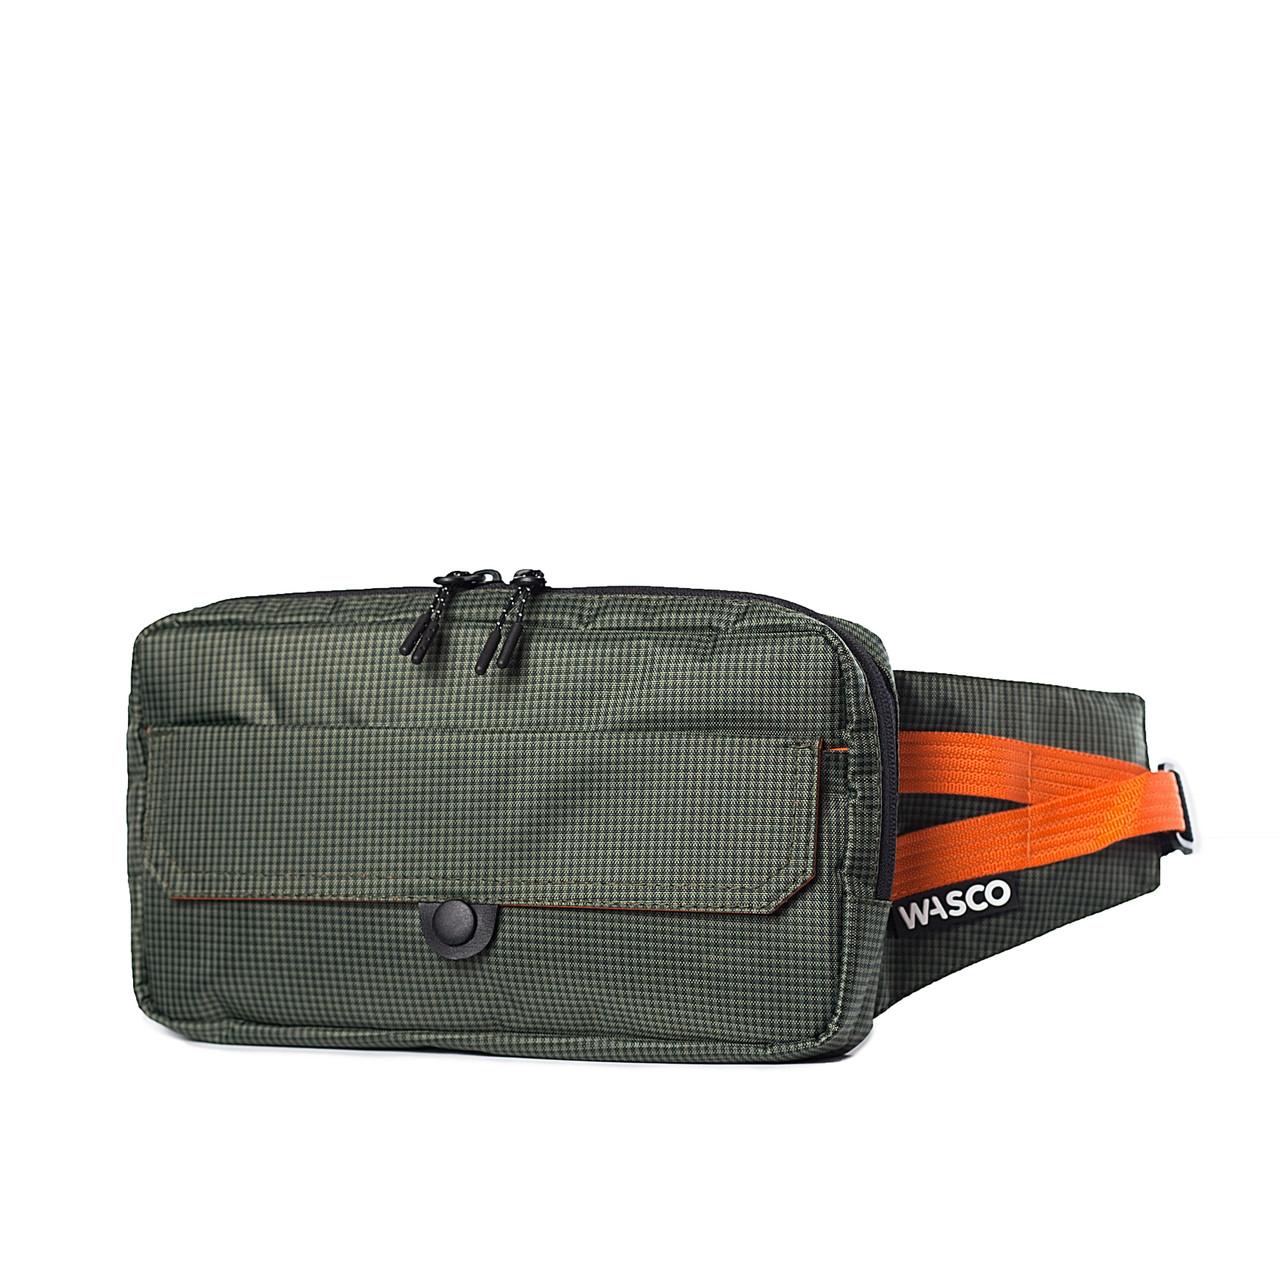 Поясная сумка Wasco G1 Хаки-Оранж